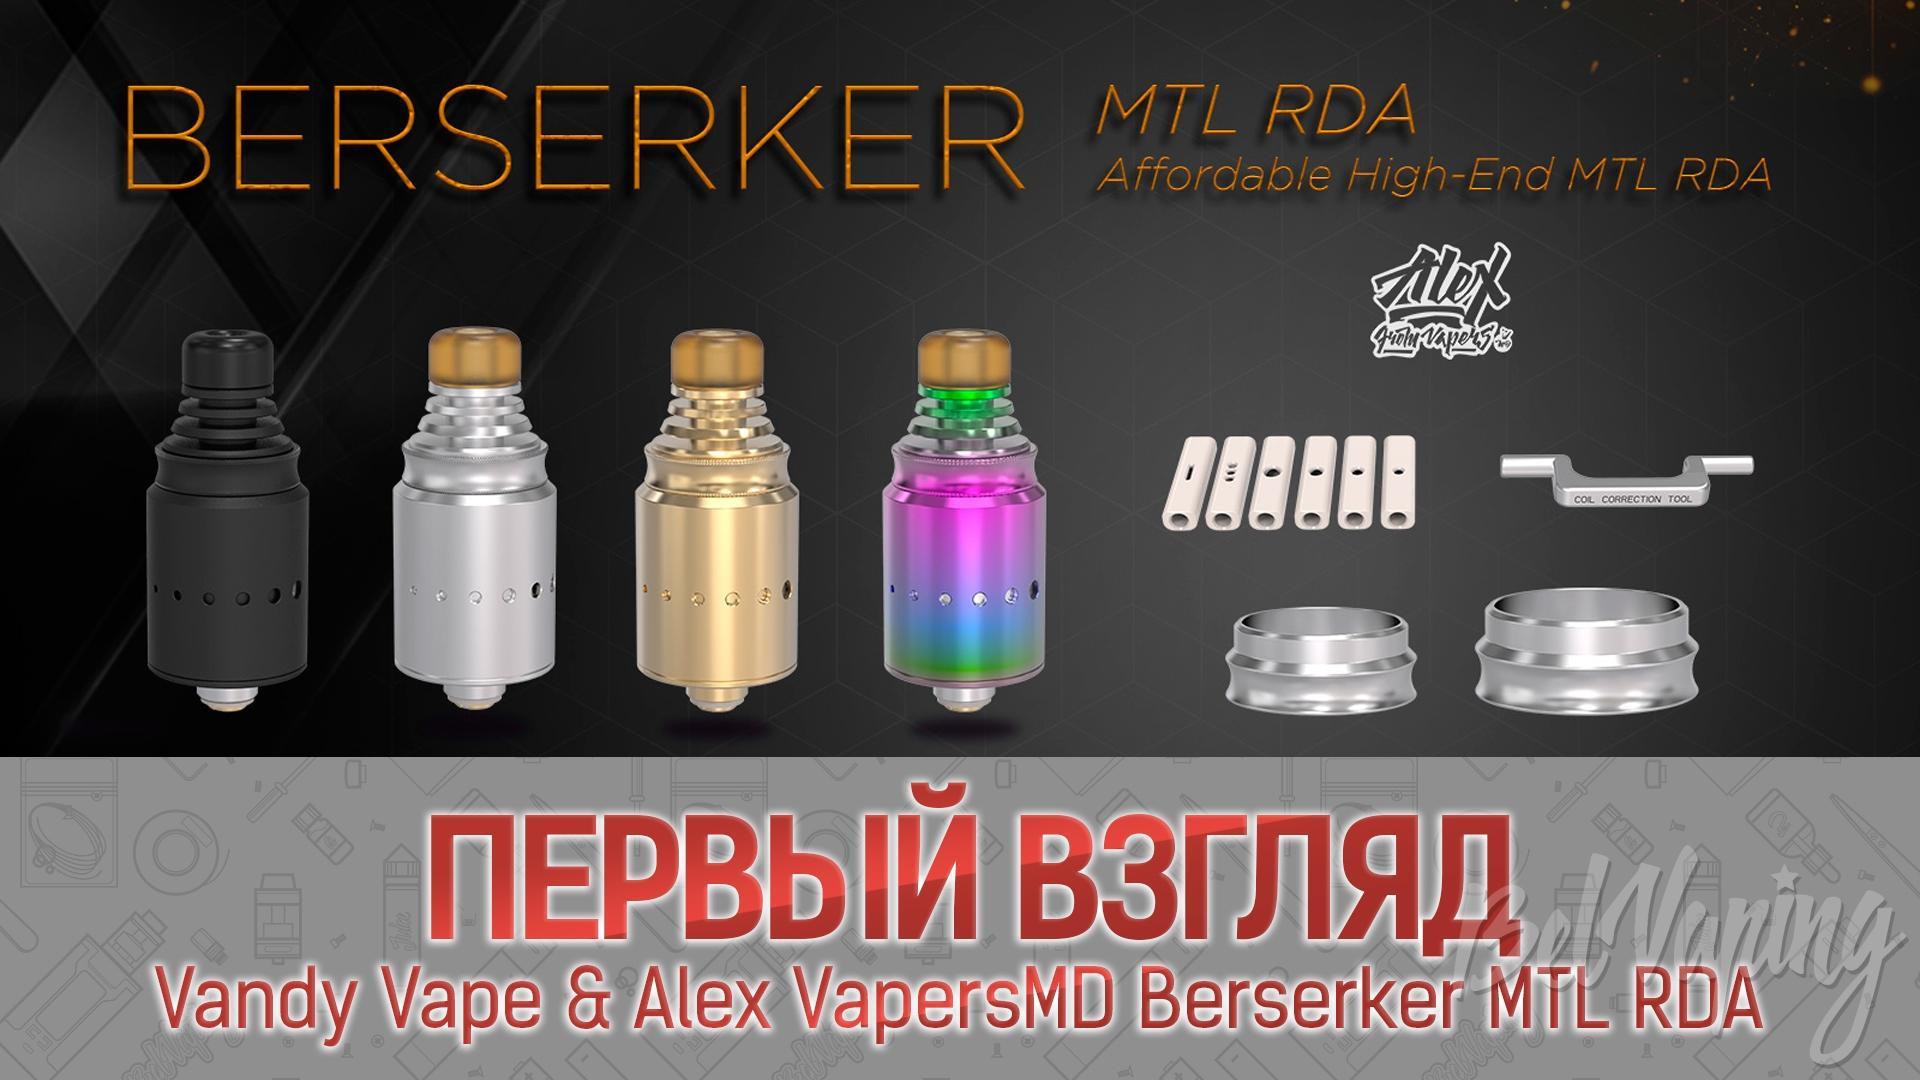 Vandy Vape & Alex VapersMD Berserker MTL RDA. Первый взгляд